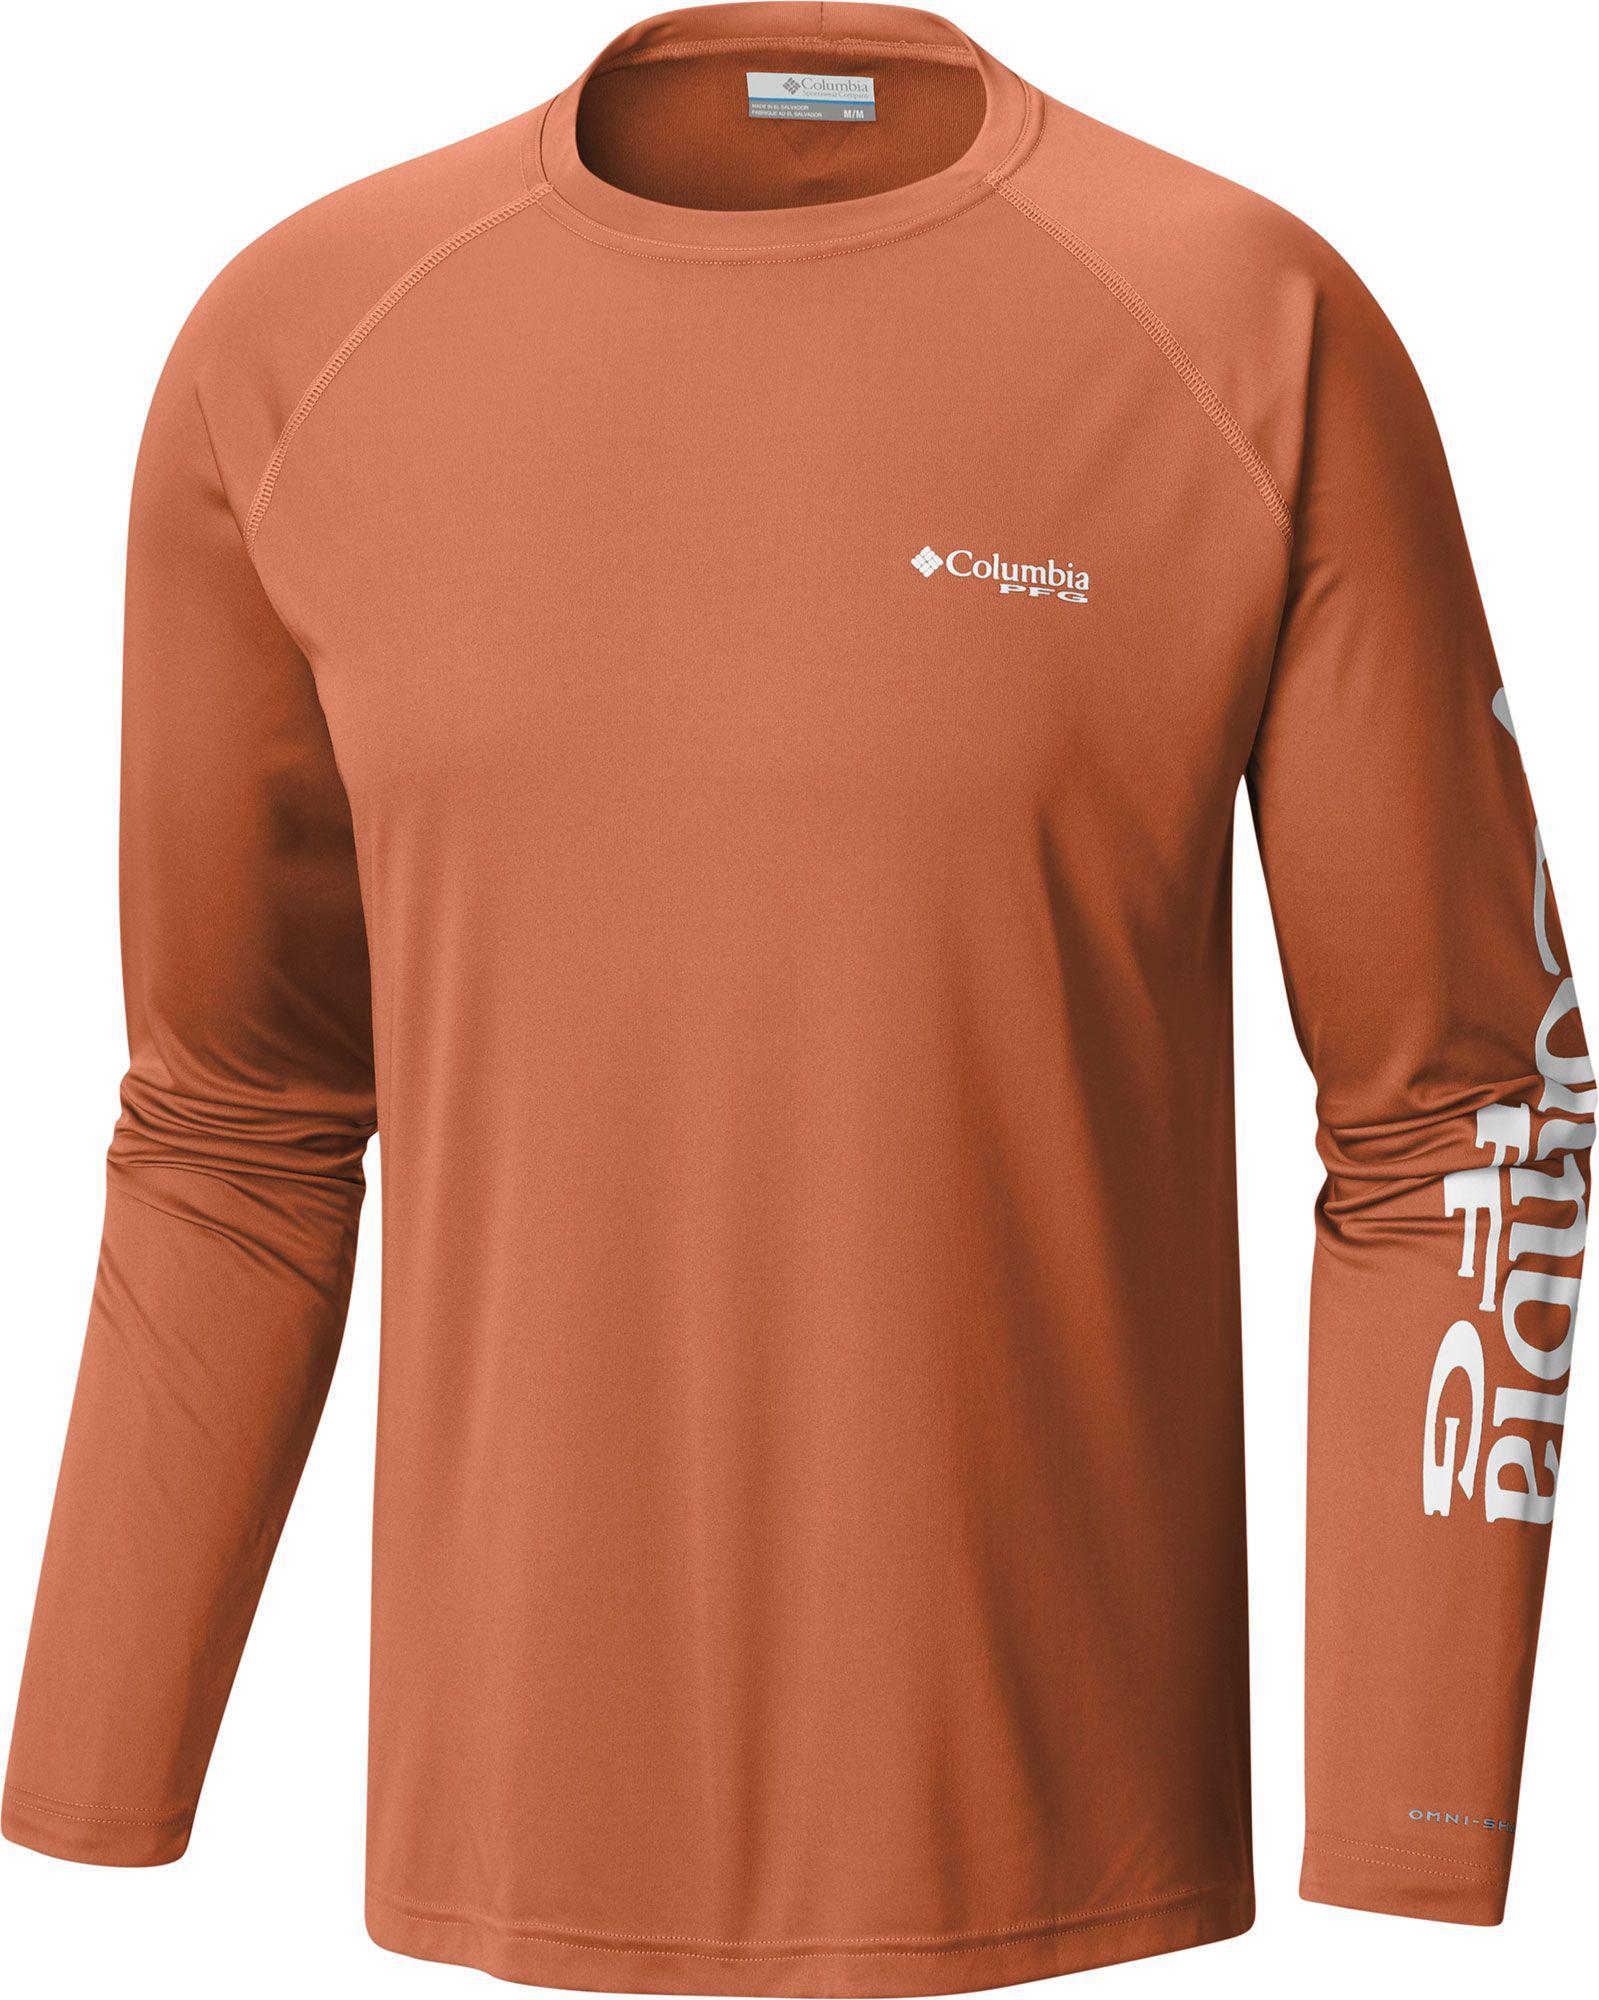 790fa406d61 Columbia Pfg Terminal Tackle Long Sleeve Shirt in Orange for Men - Lyst